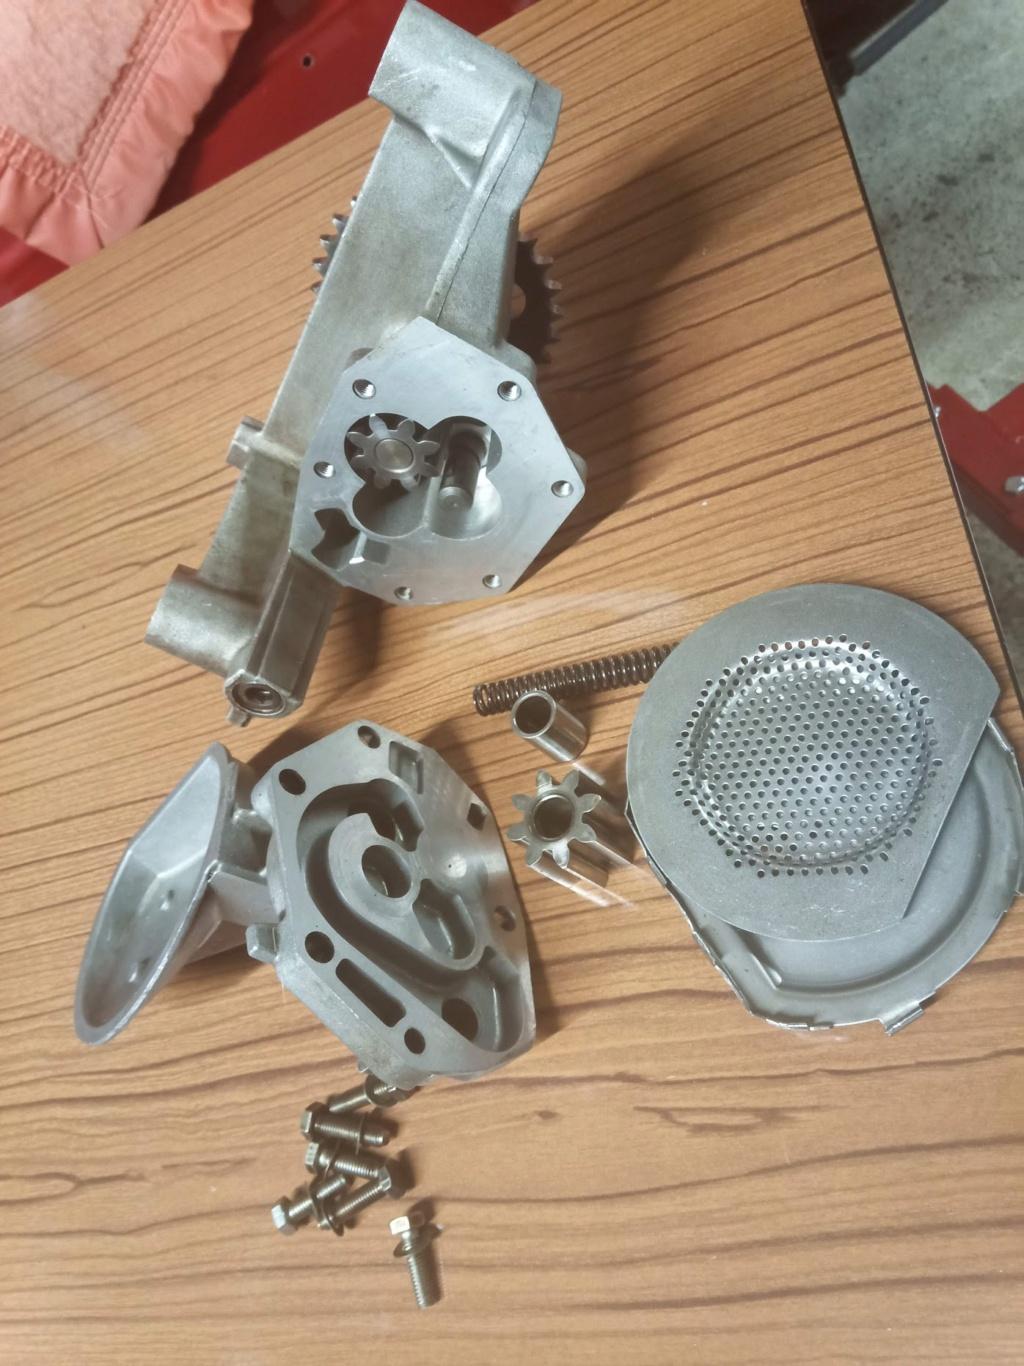 Moteur 1,9l GTI D6B et Moteur 1,9l de 405 SRI D6D - Page 2 Img_2023